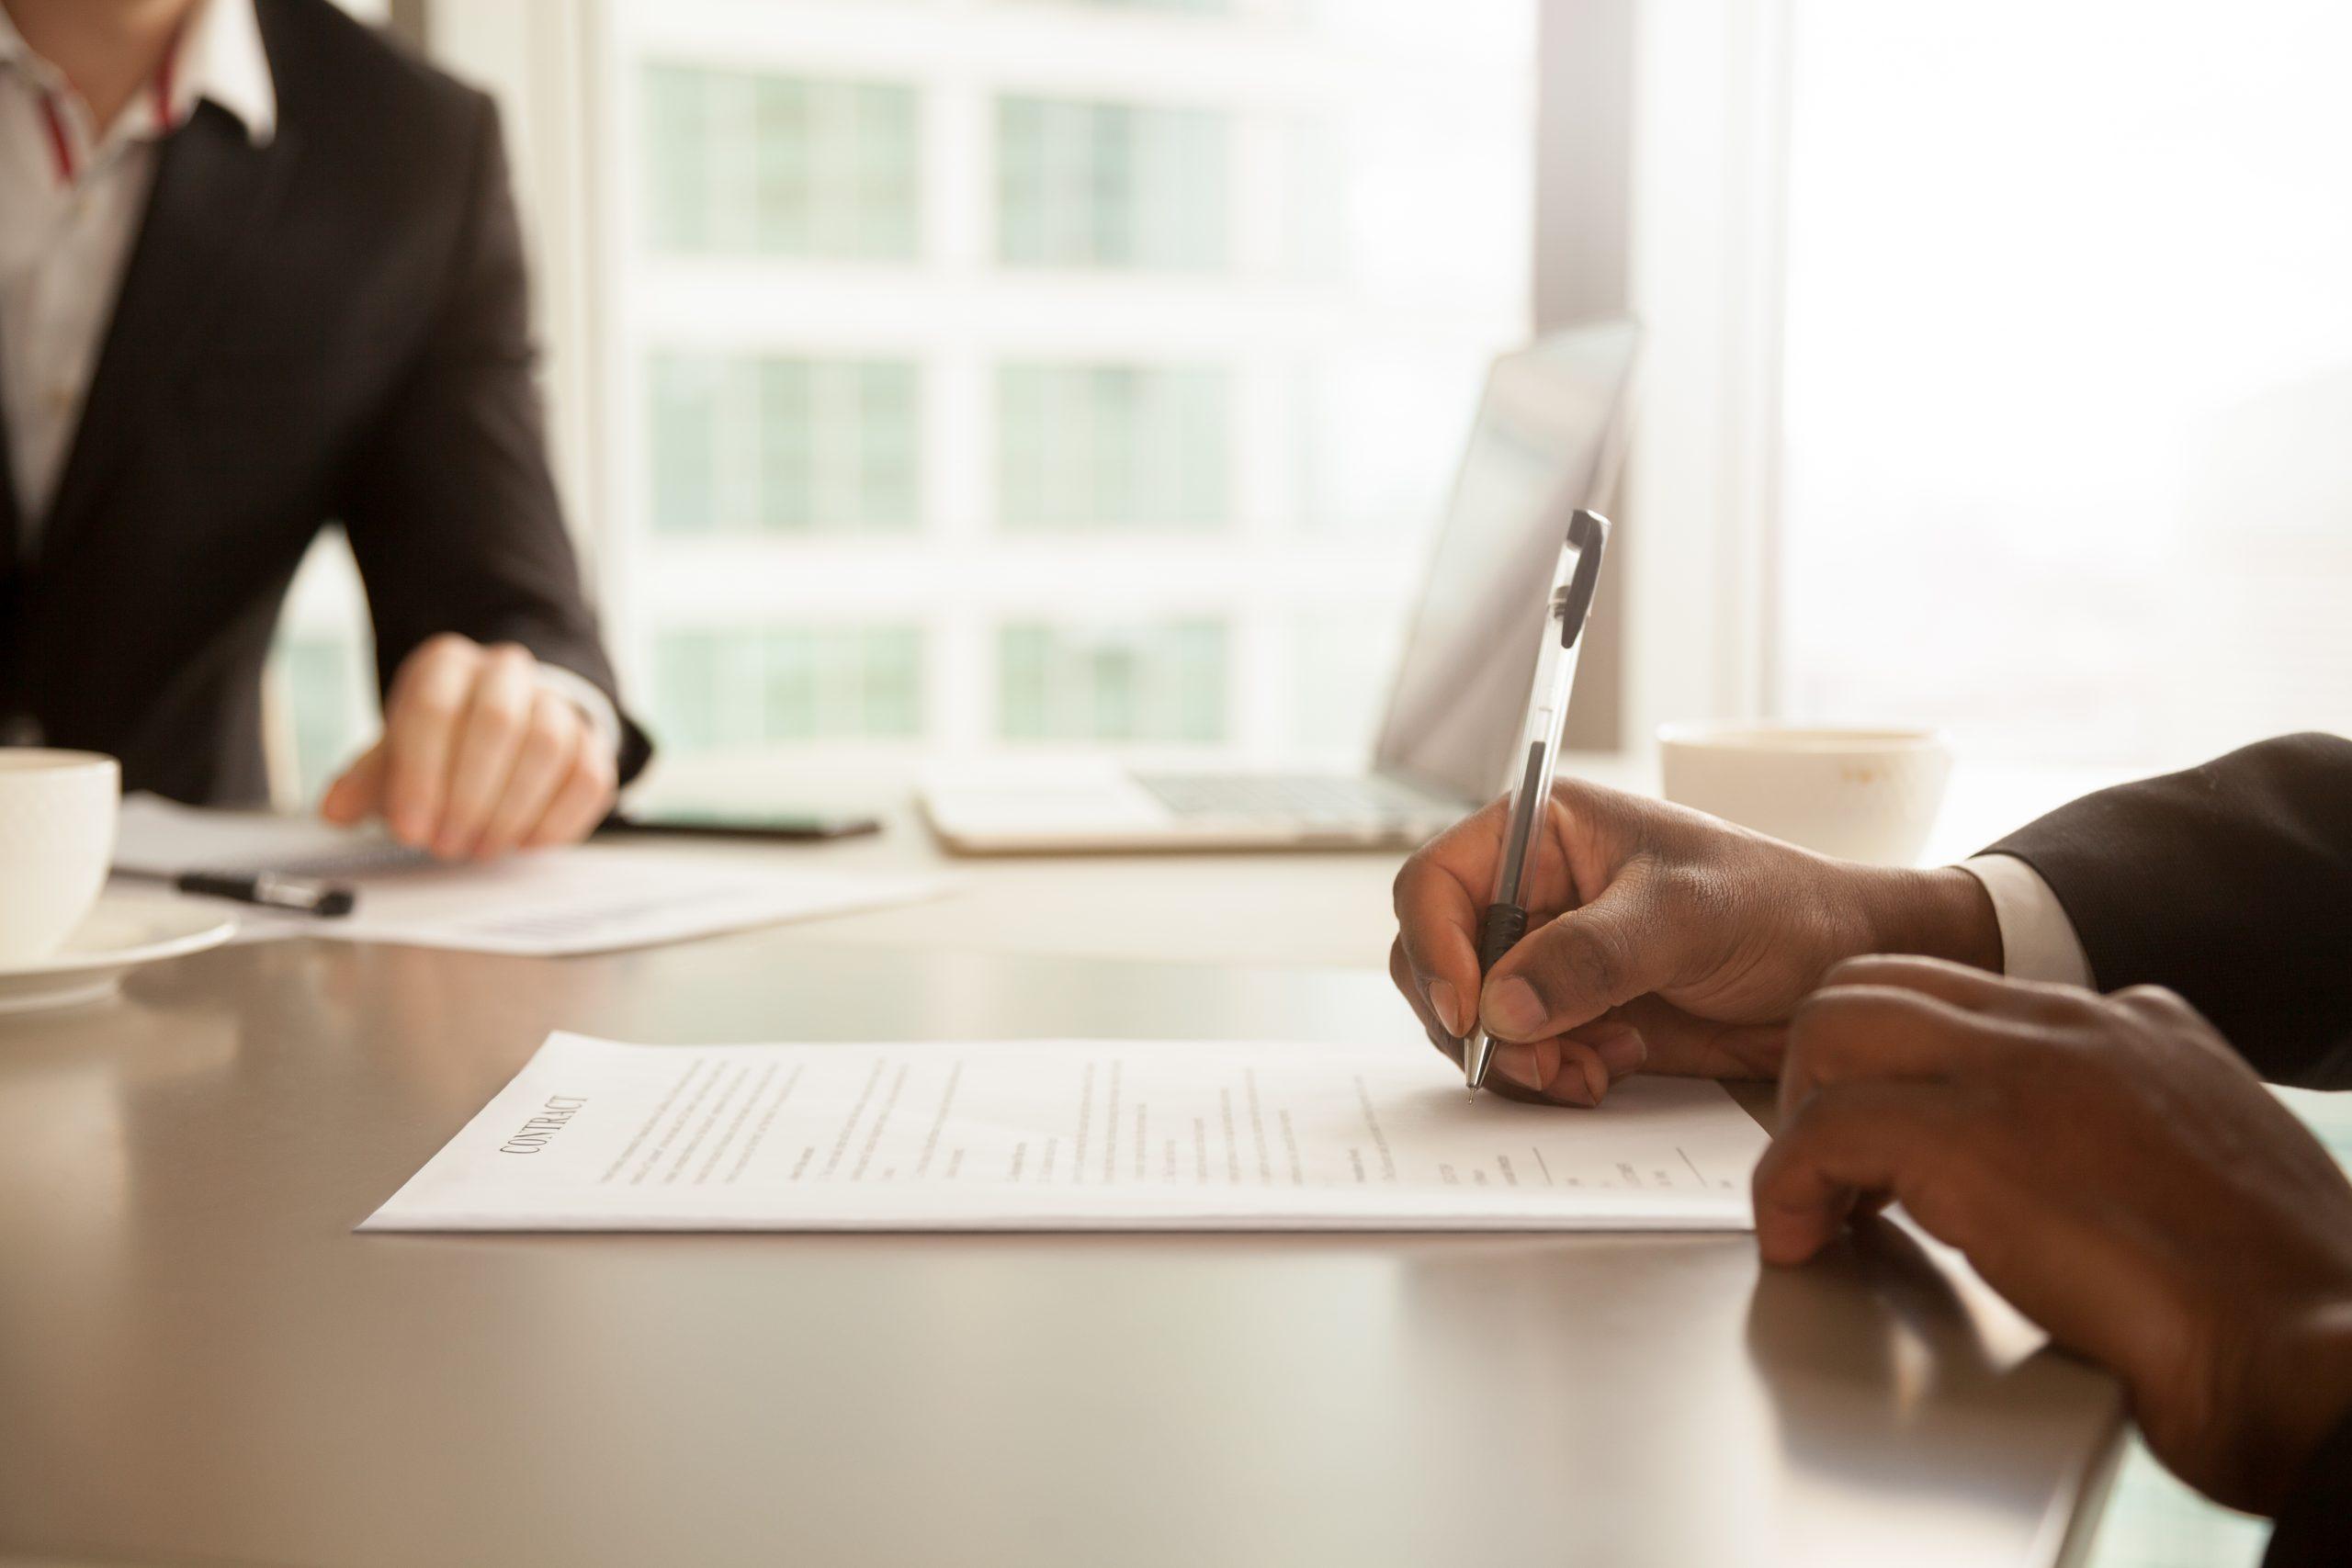 Modalidades de contrato de trabalho (Parte 2)